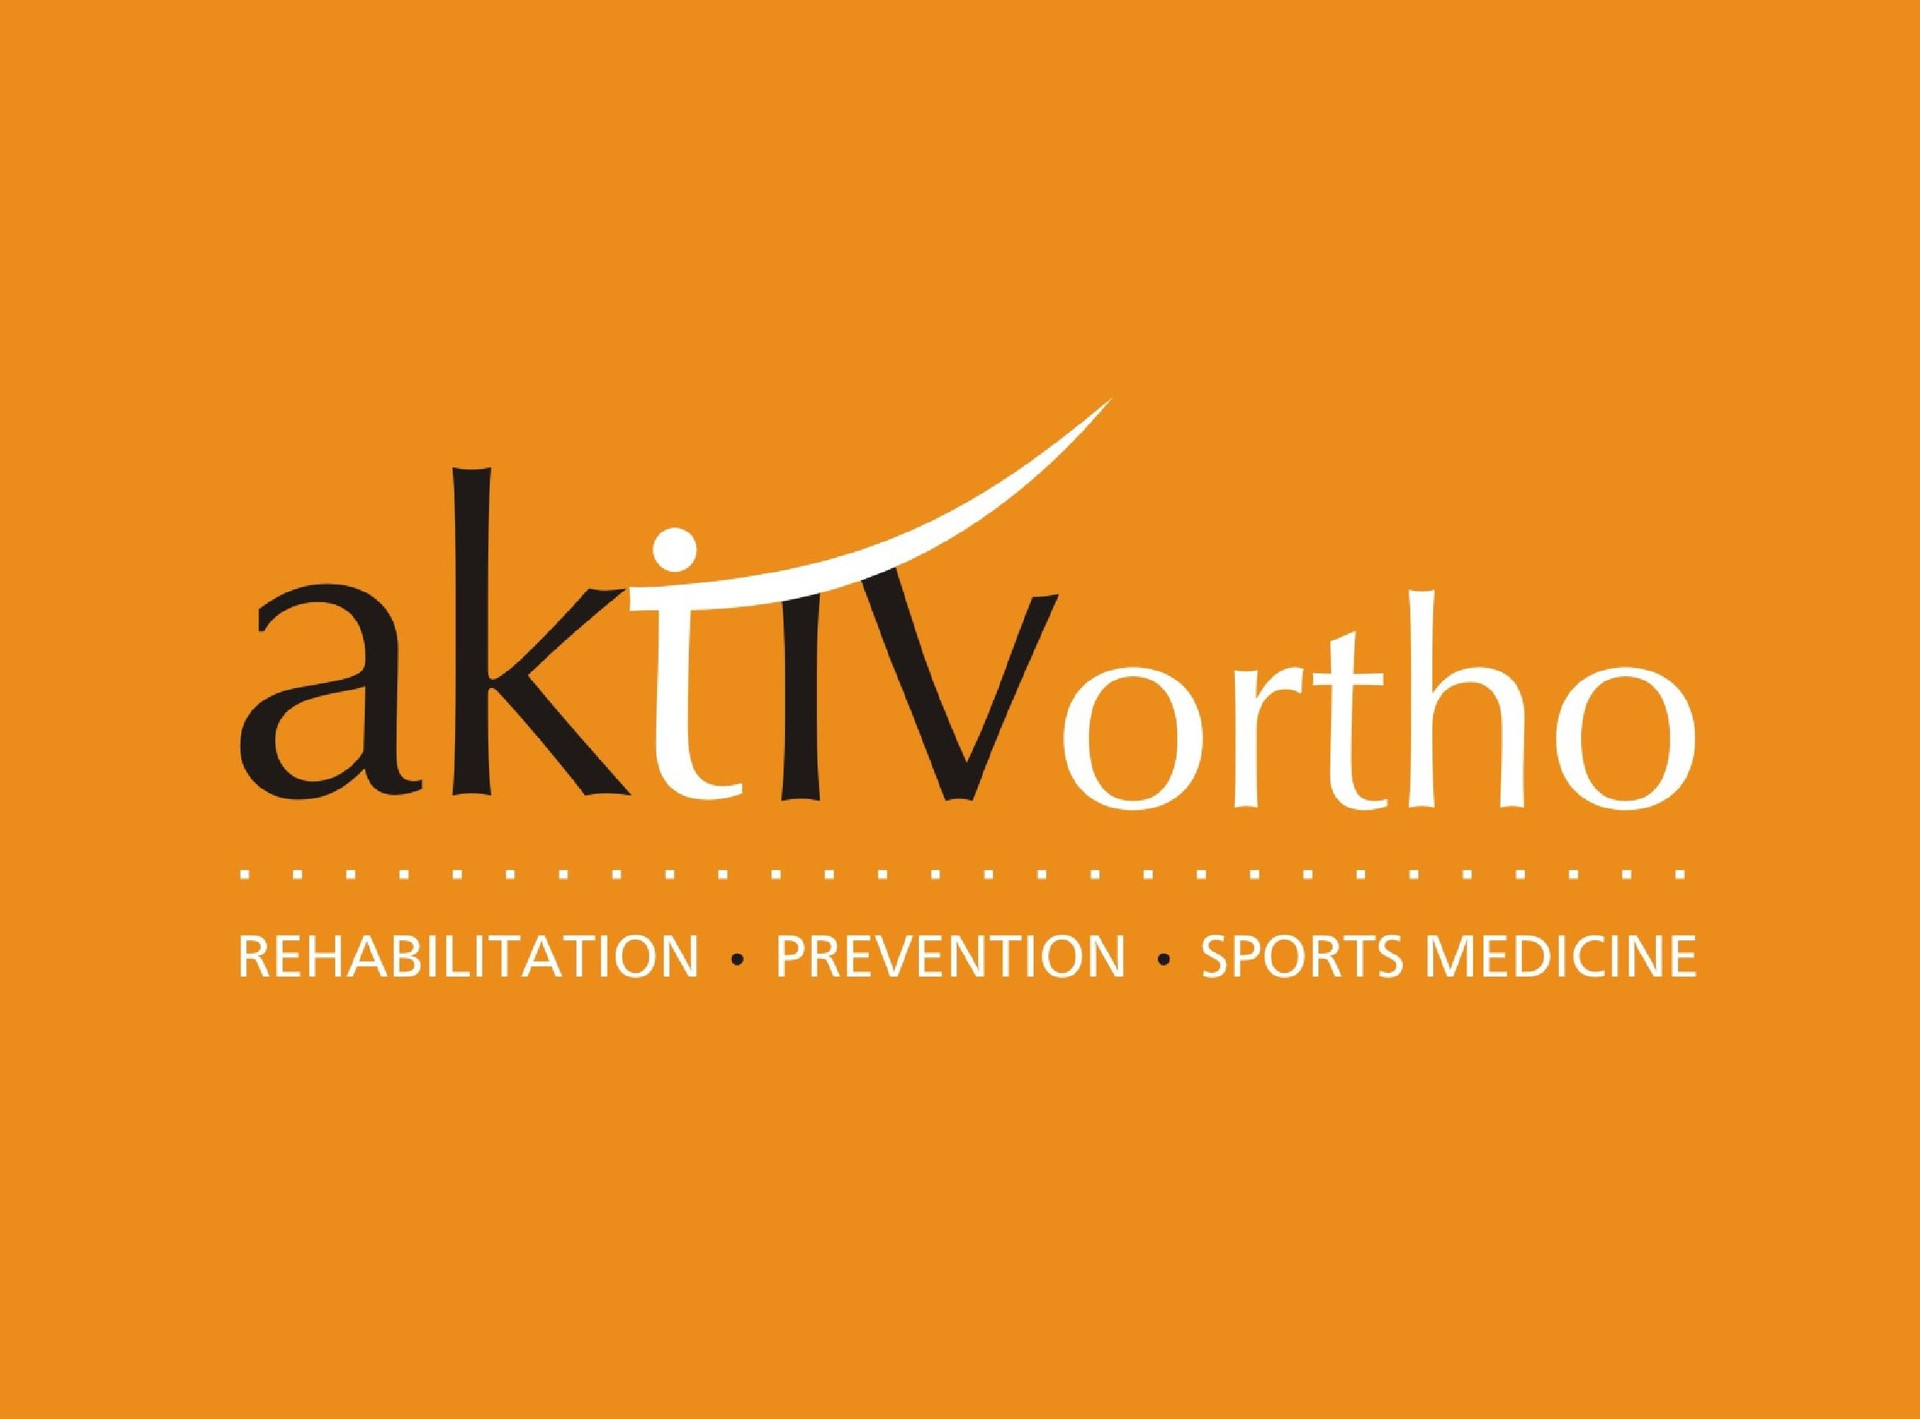 ortho logo 2.jpg